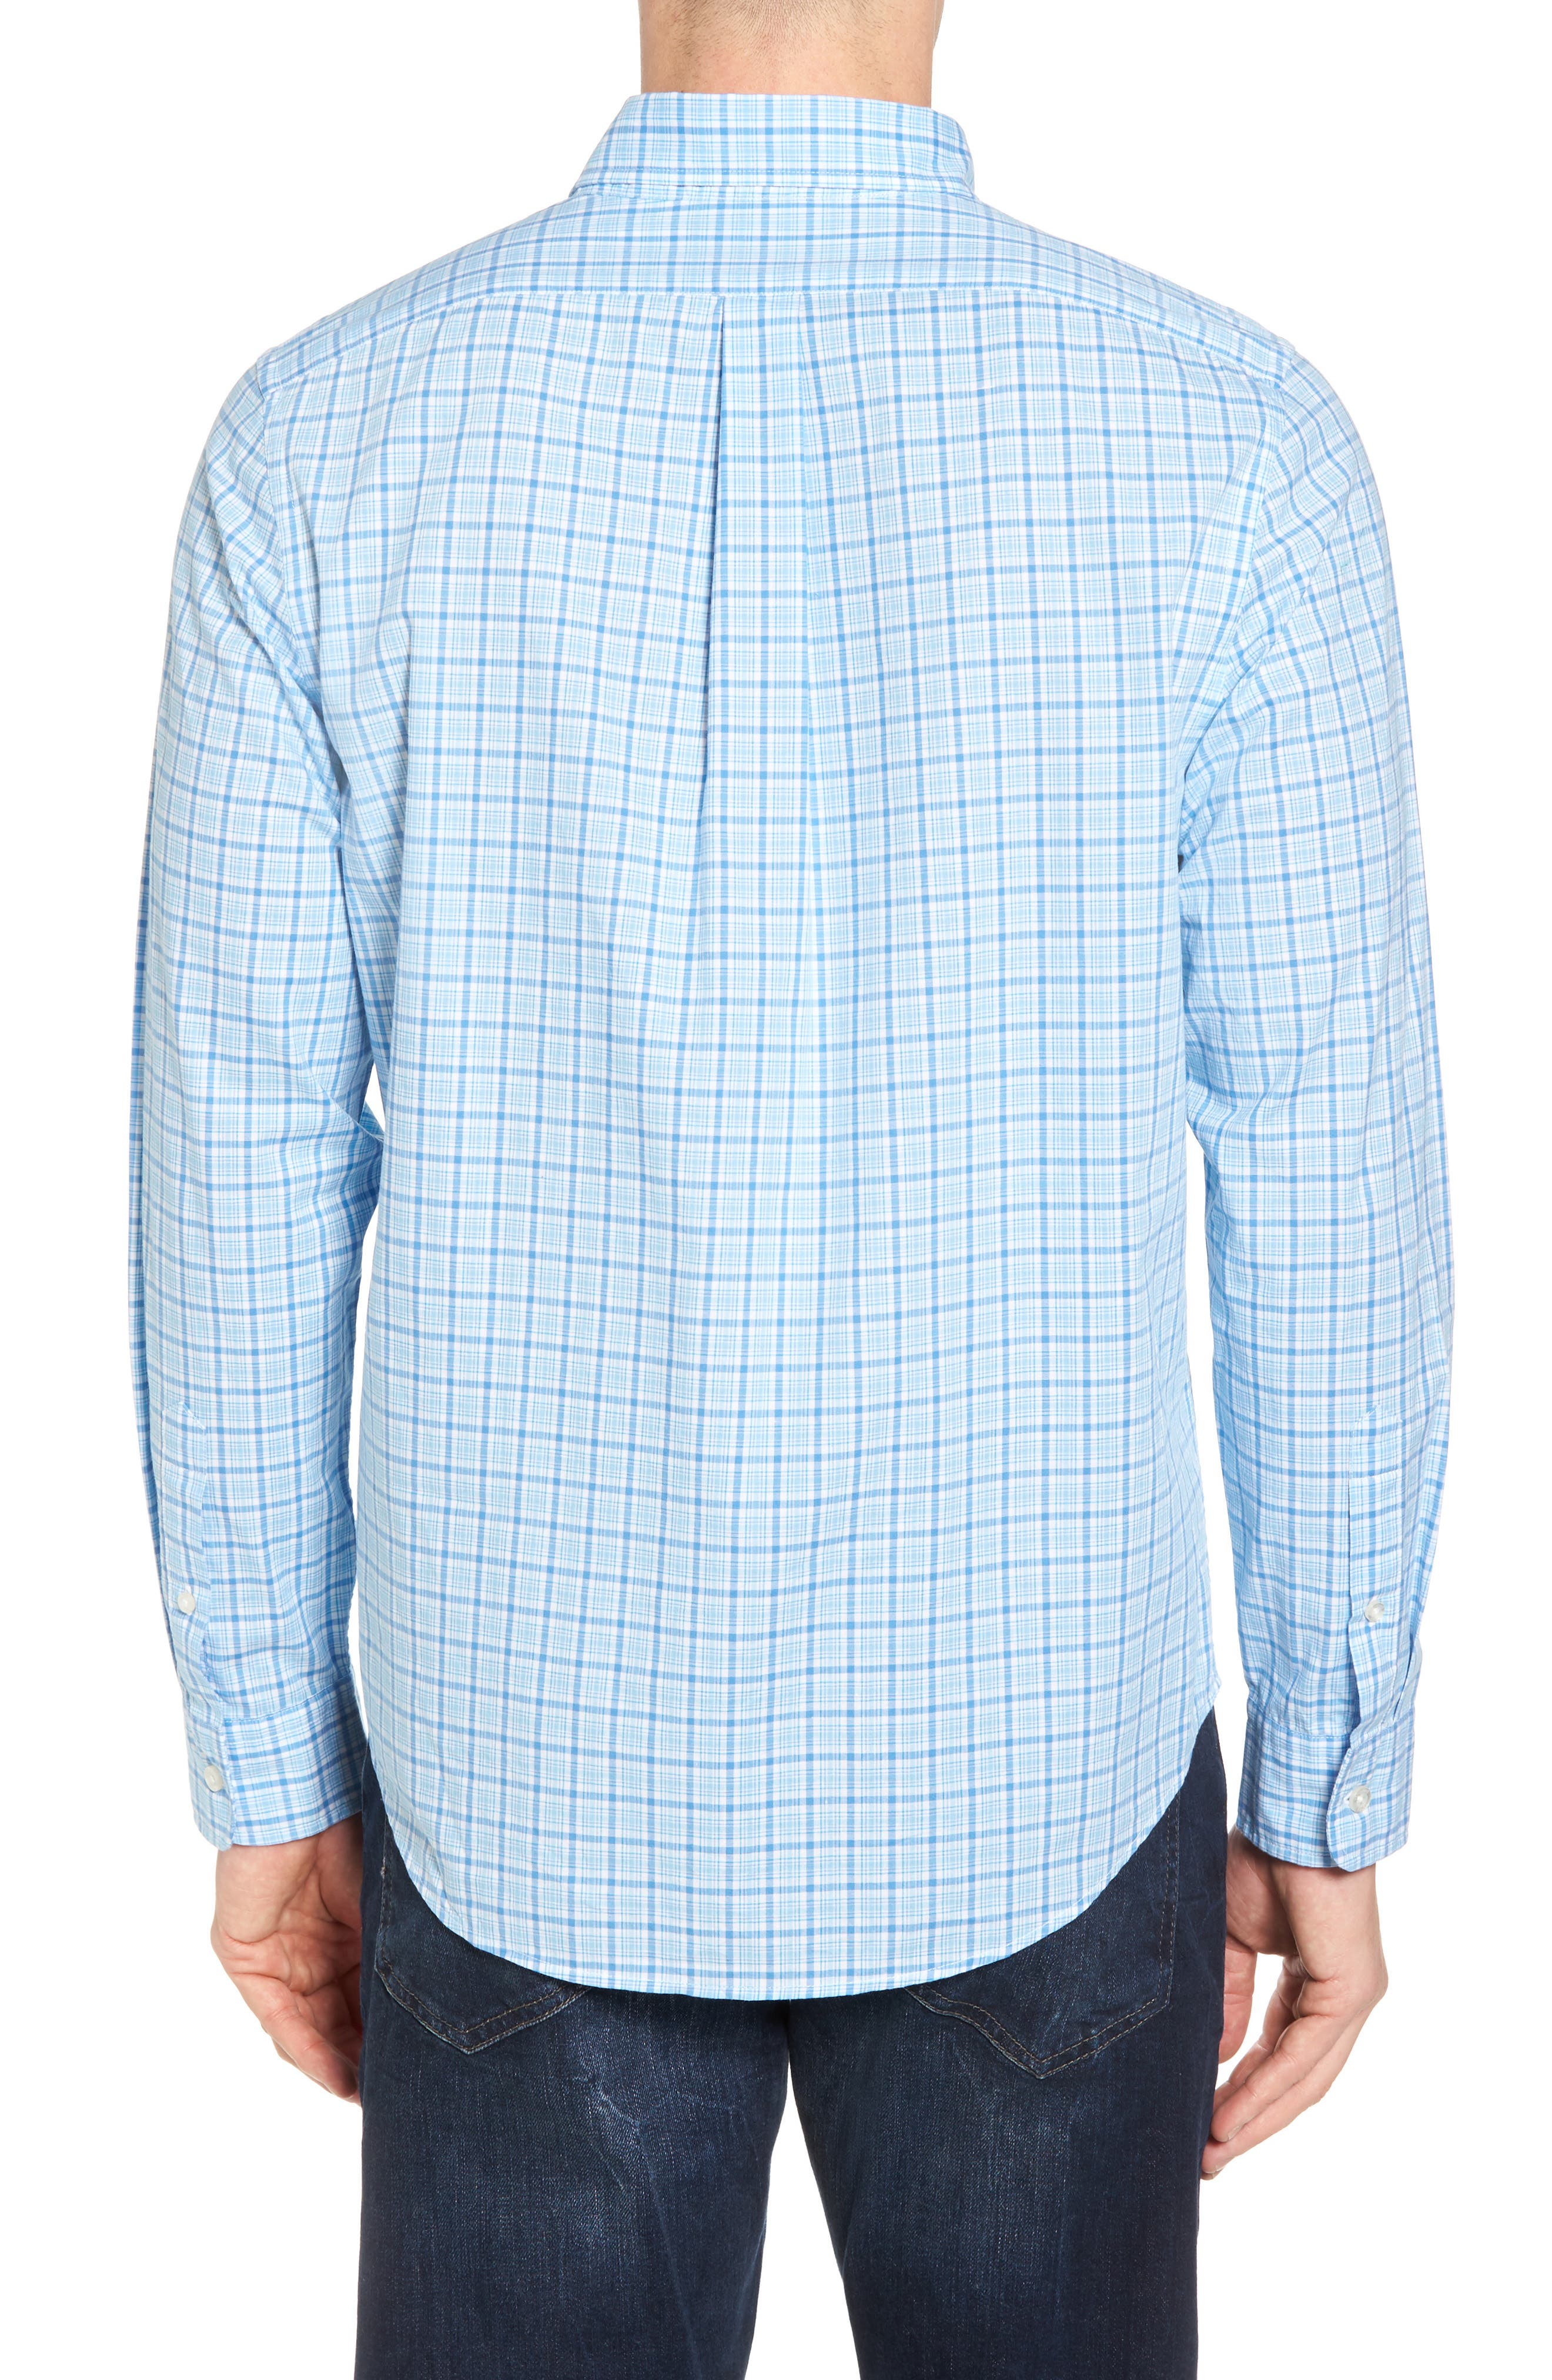 Seawatch Slim Fit Plaid Sport Shirt,                             Alternate thumbnail 2, color,                             459